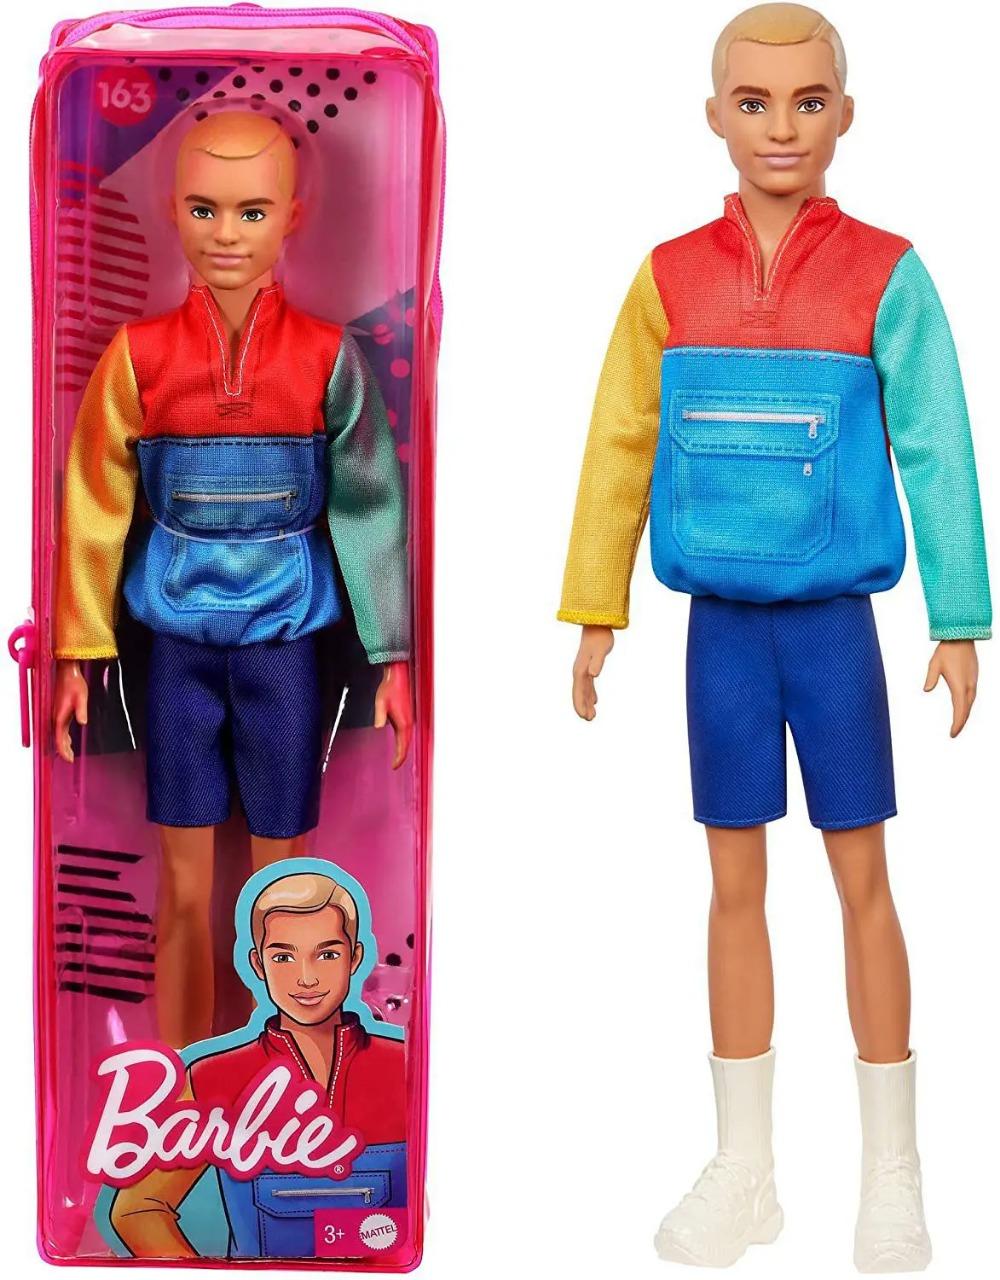 Boneco Barbie Ken Fashionista Cabelo Loiro Esculpido Usando Blusa Estilo jaqueta Modelo 163 Mattel